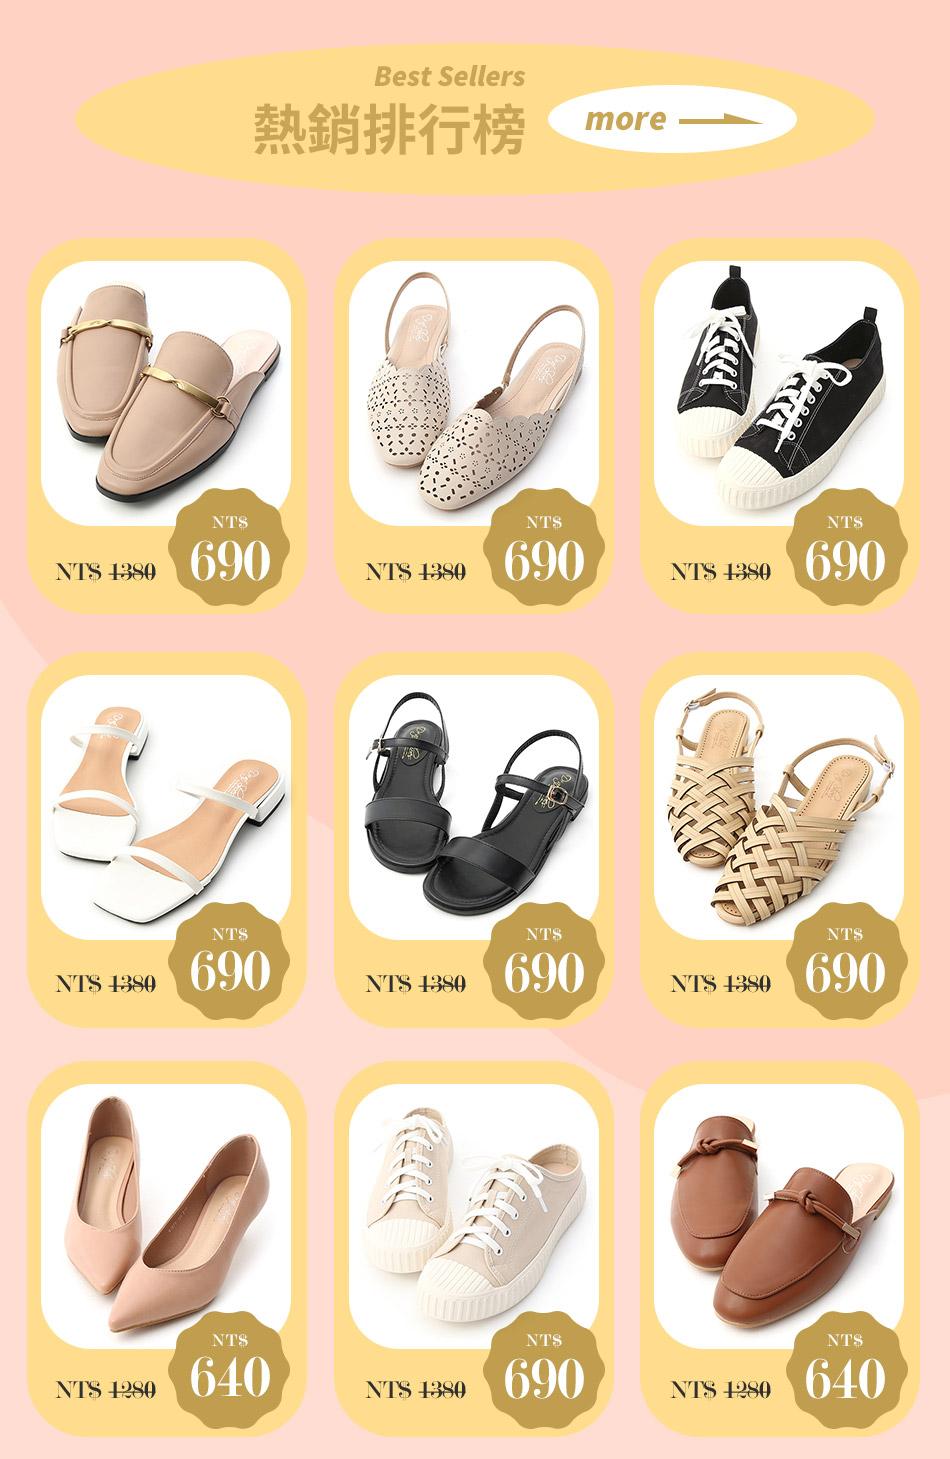 D+AF流行女鞋熱銷榜 熱銷鞋款限時5折